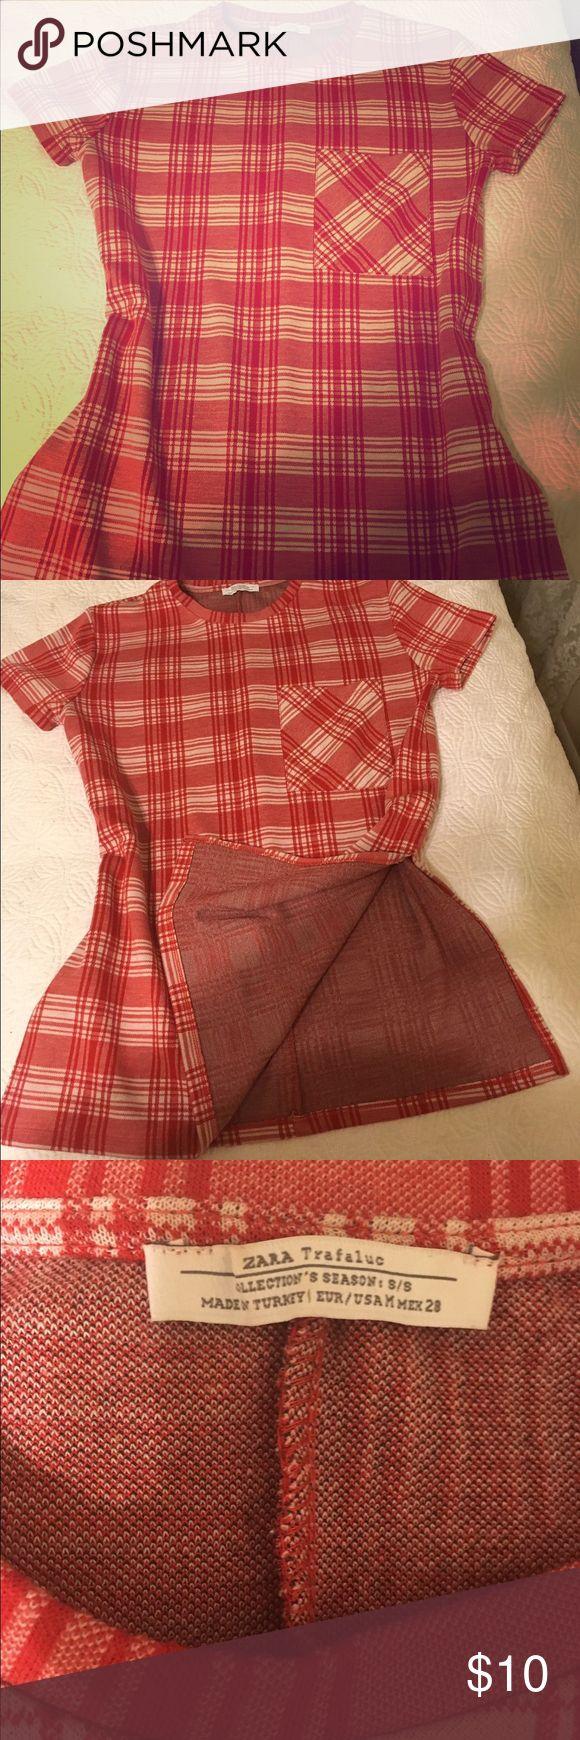 Zara plaid tunic Zara red plaid trafaluc tunic . Perfect condition slots on sides as shown Zara Tops